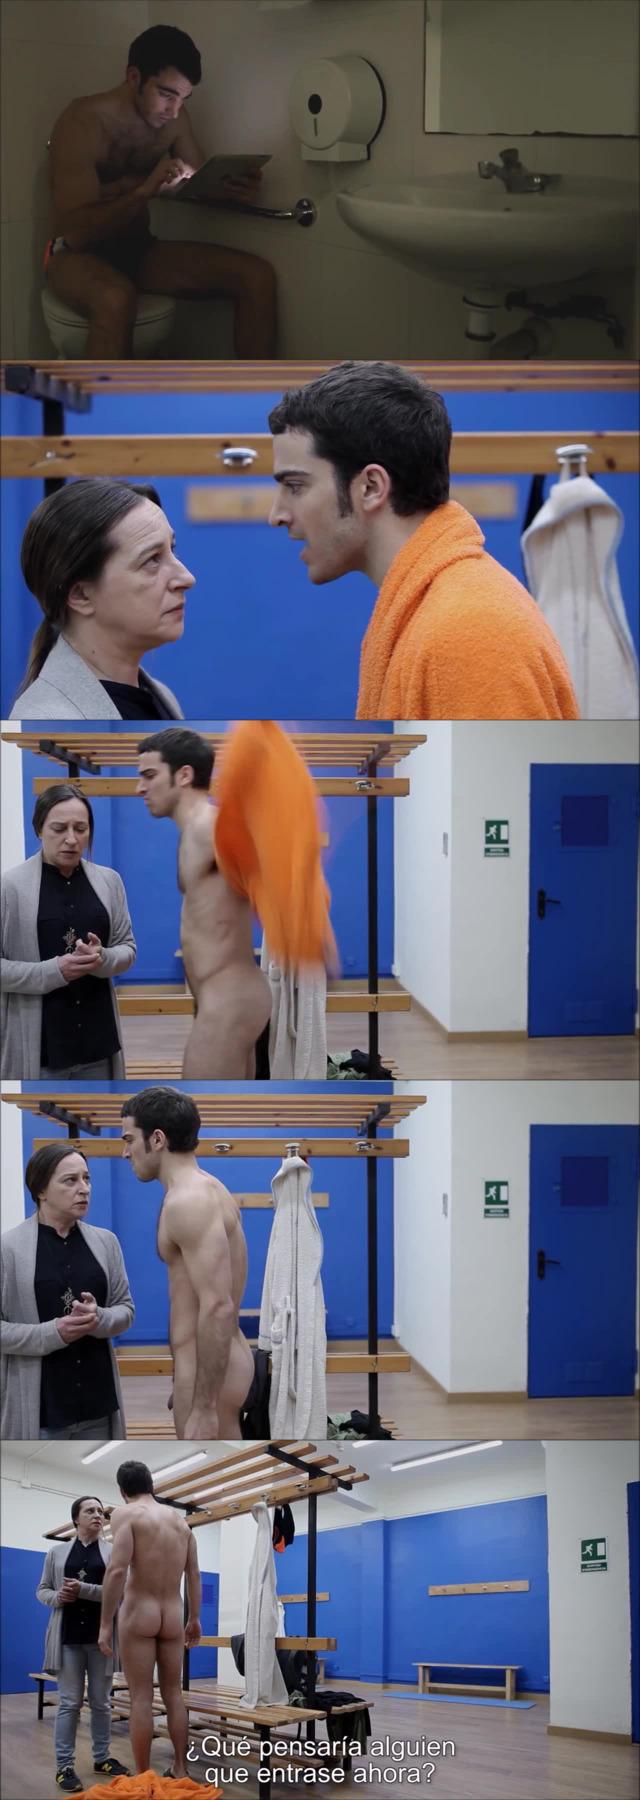 ruben de eguia naked movie full frontal